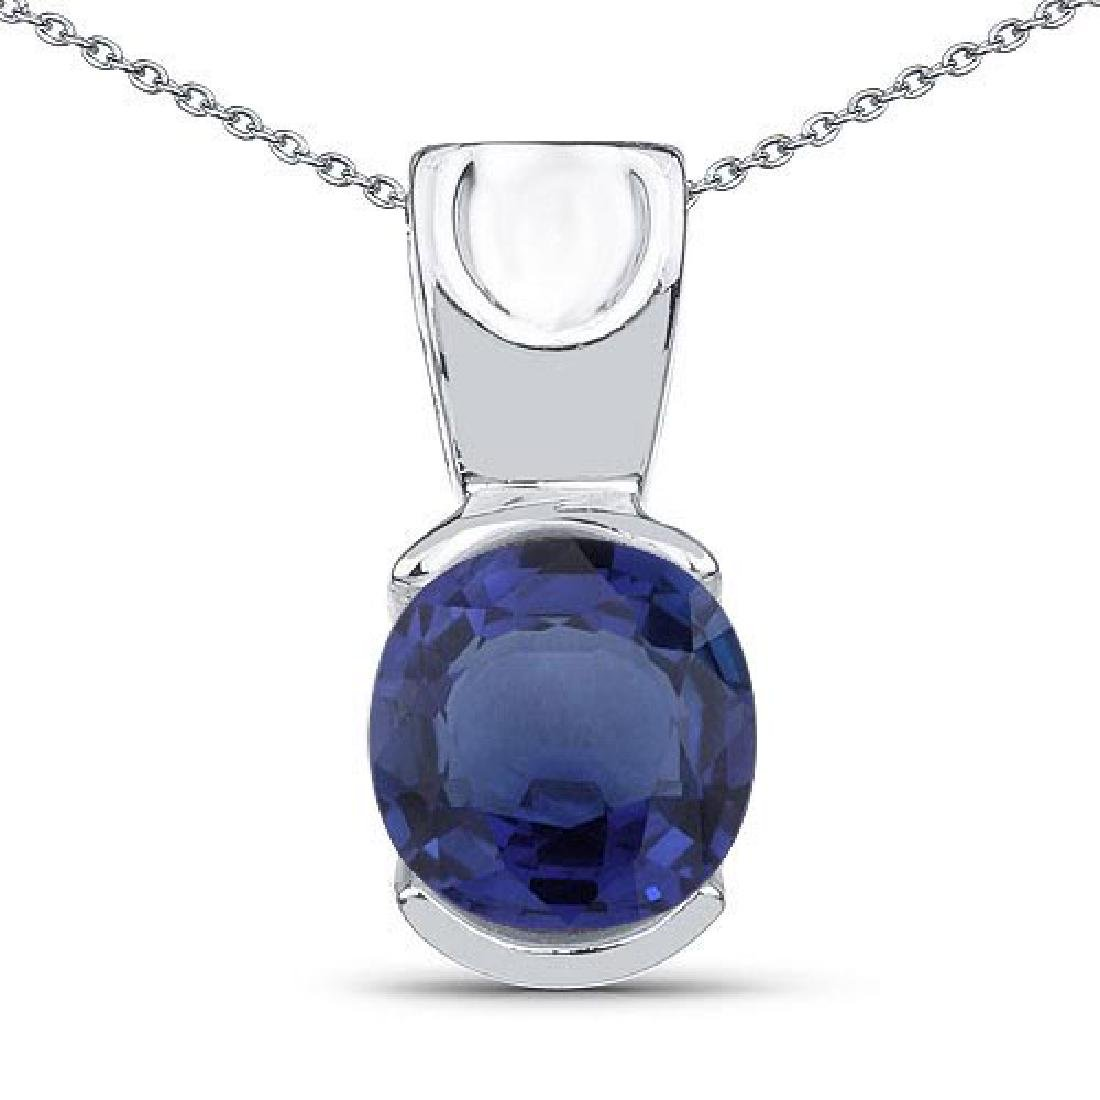 Certified 1.40 CTW Genuine Bule Sapphire 14K White Gold